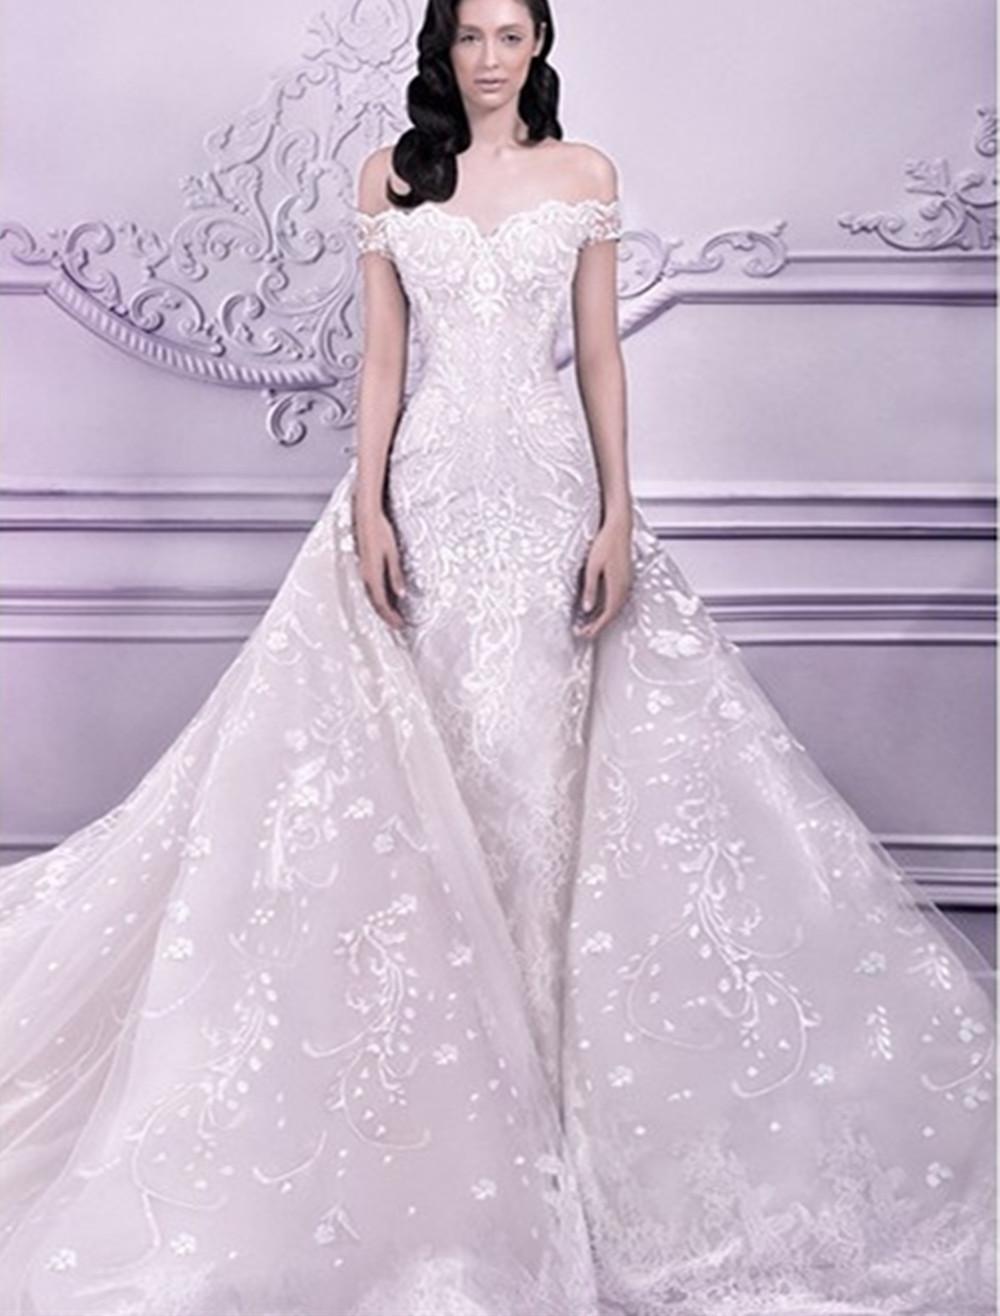 jj house wedding dresses photo - 1